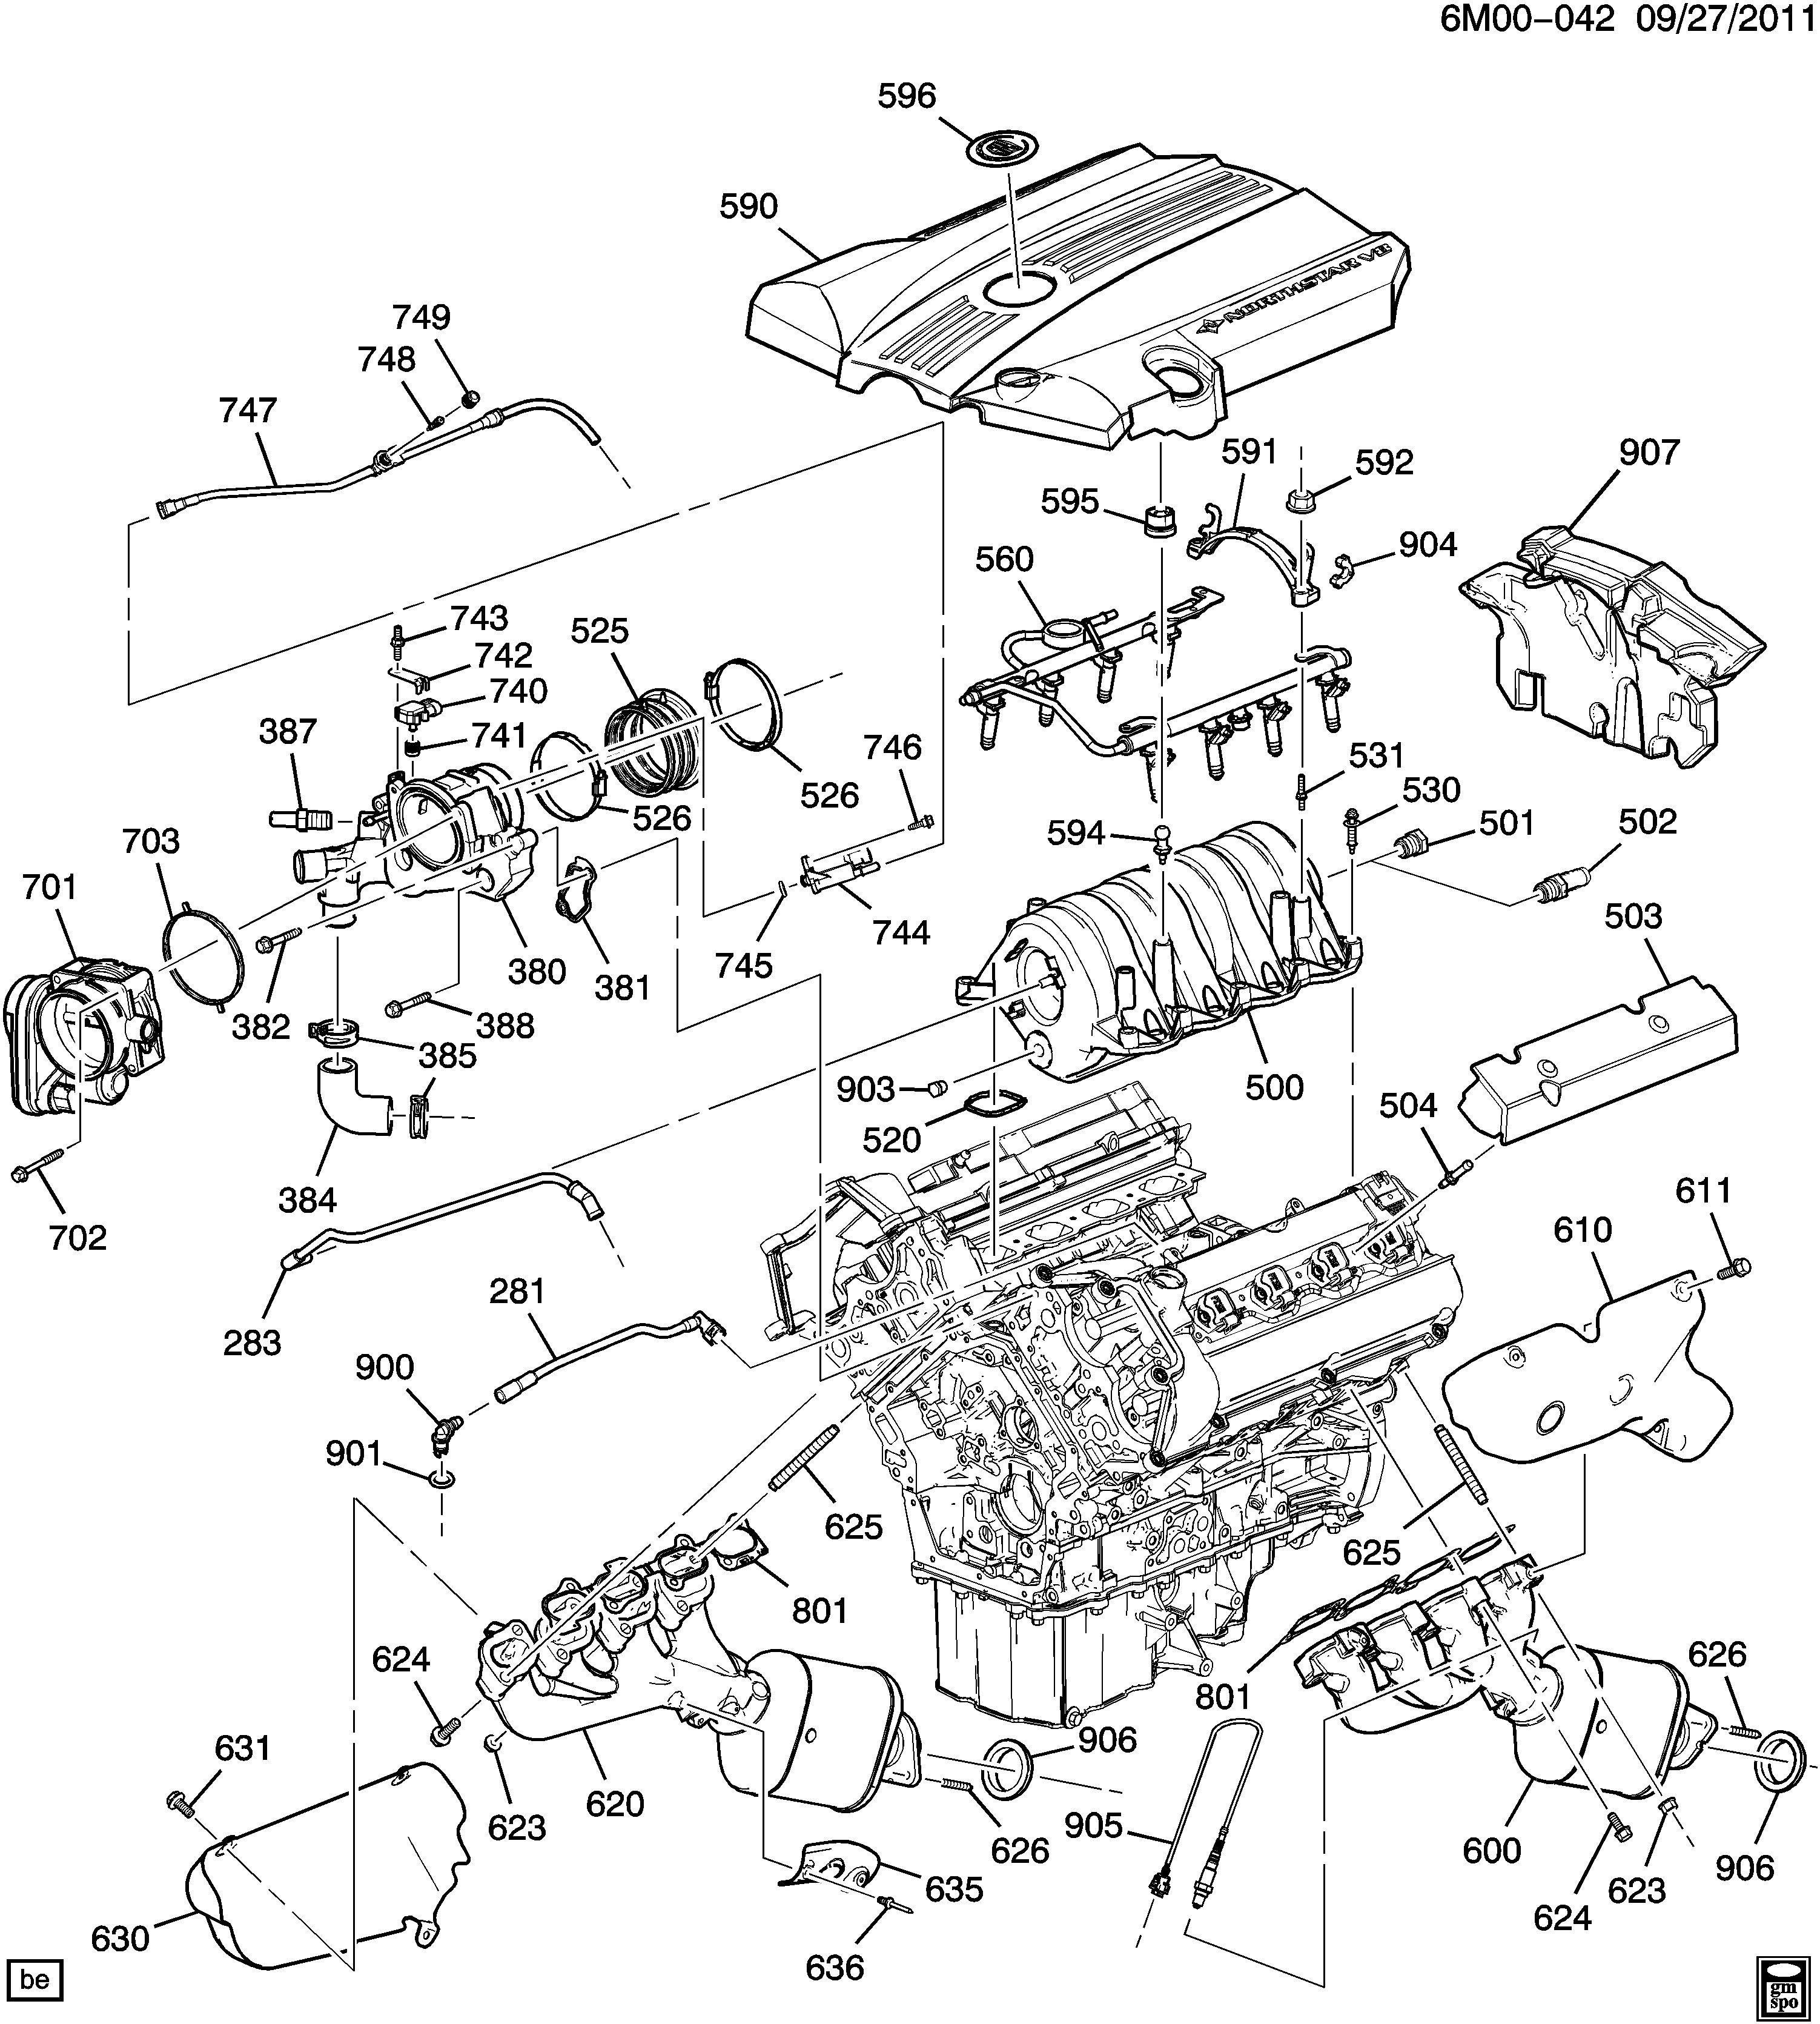 03 cadillac cts engine diagram oa 1483  2002 cadillac deville 2008 saturn vue parts diagram  cadillac deville 2008 saturn vue parts